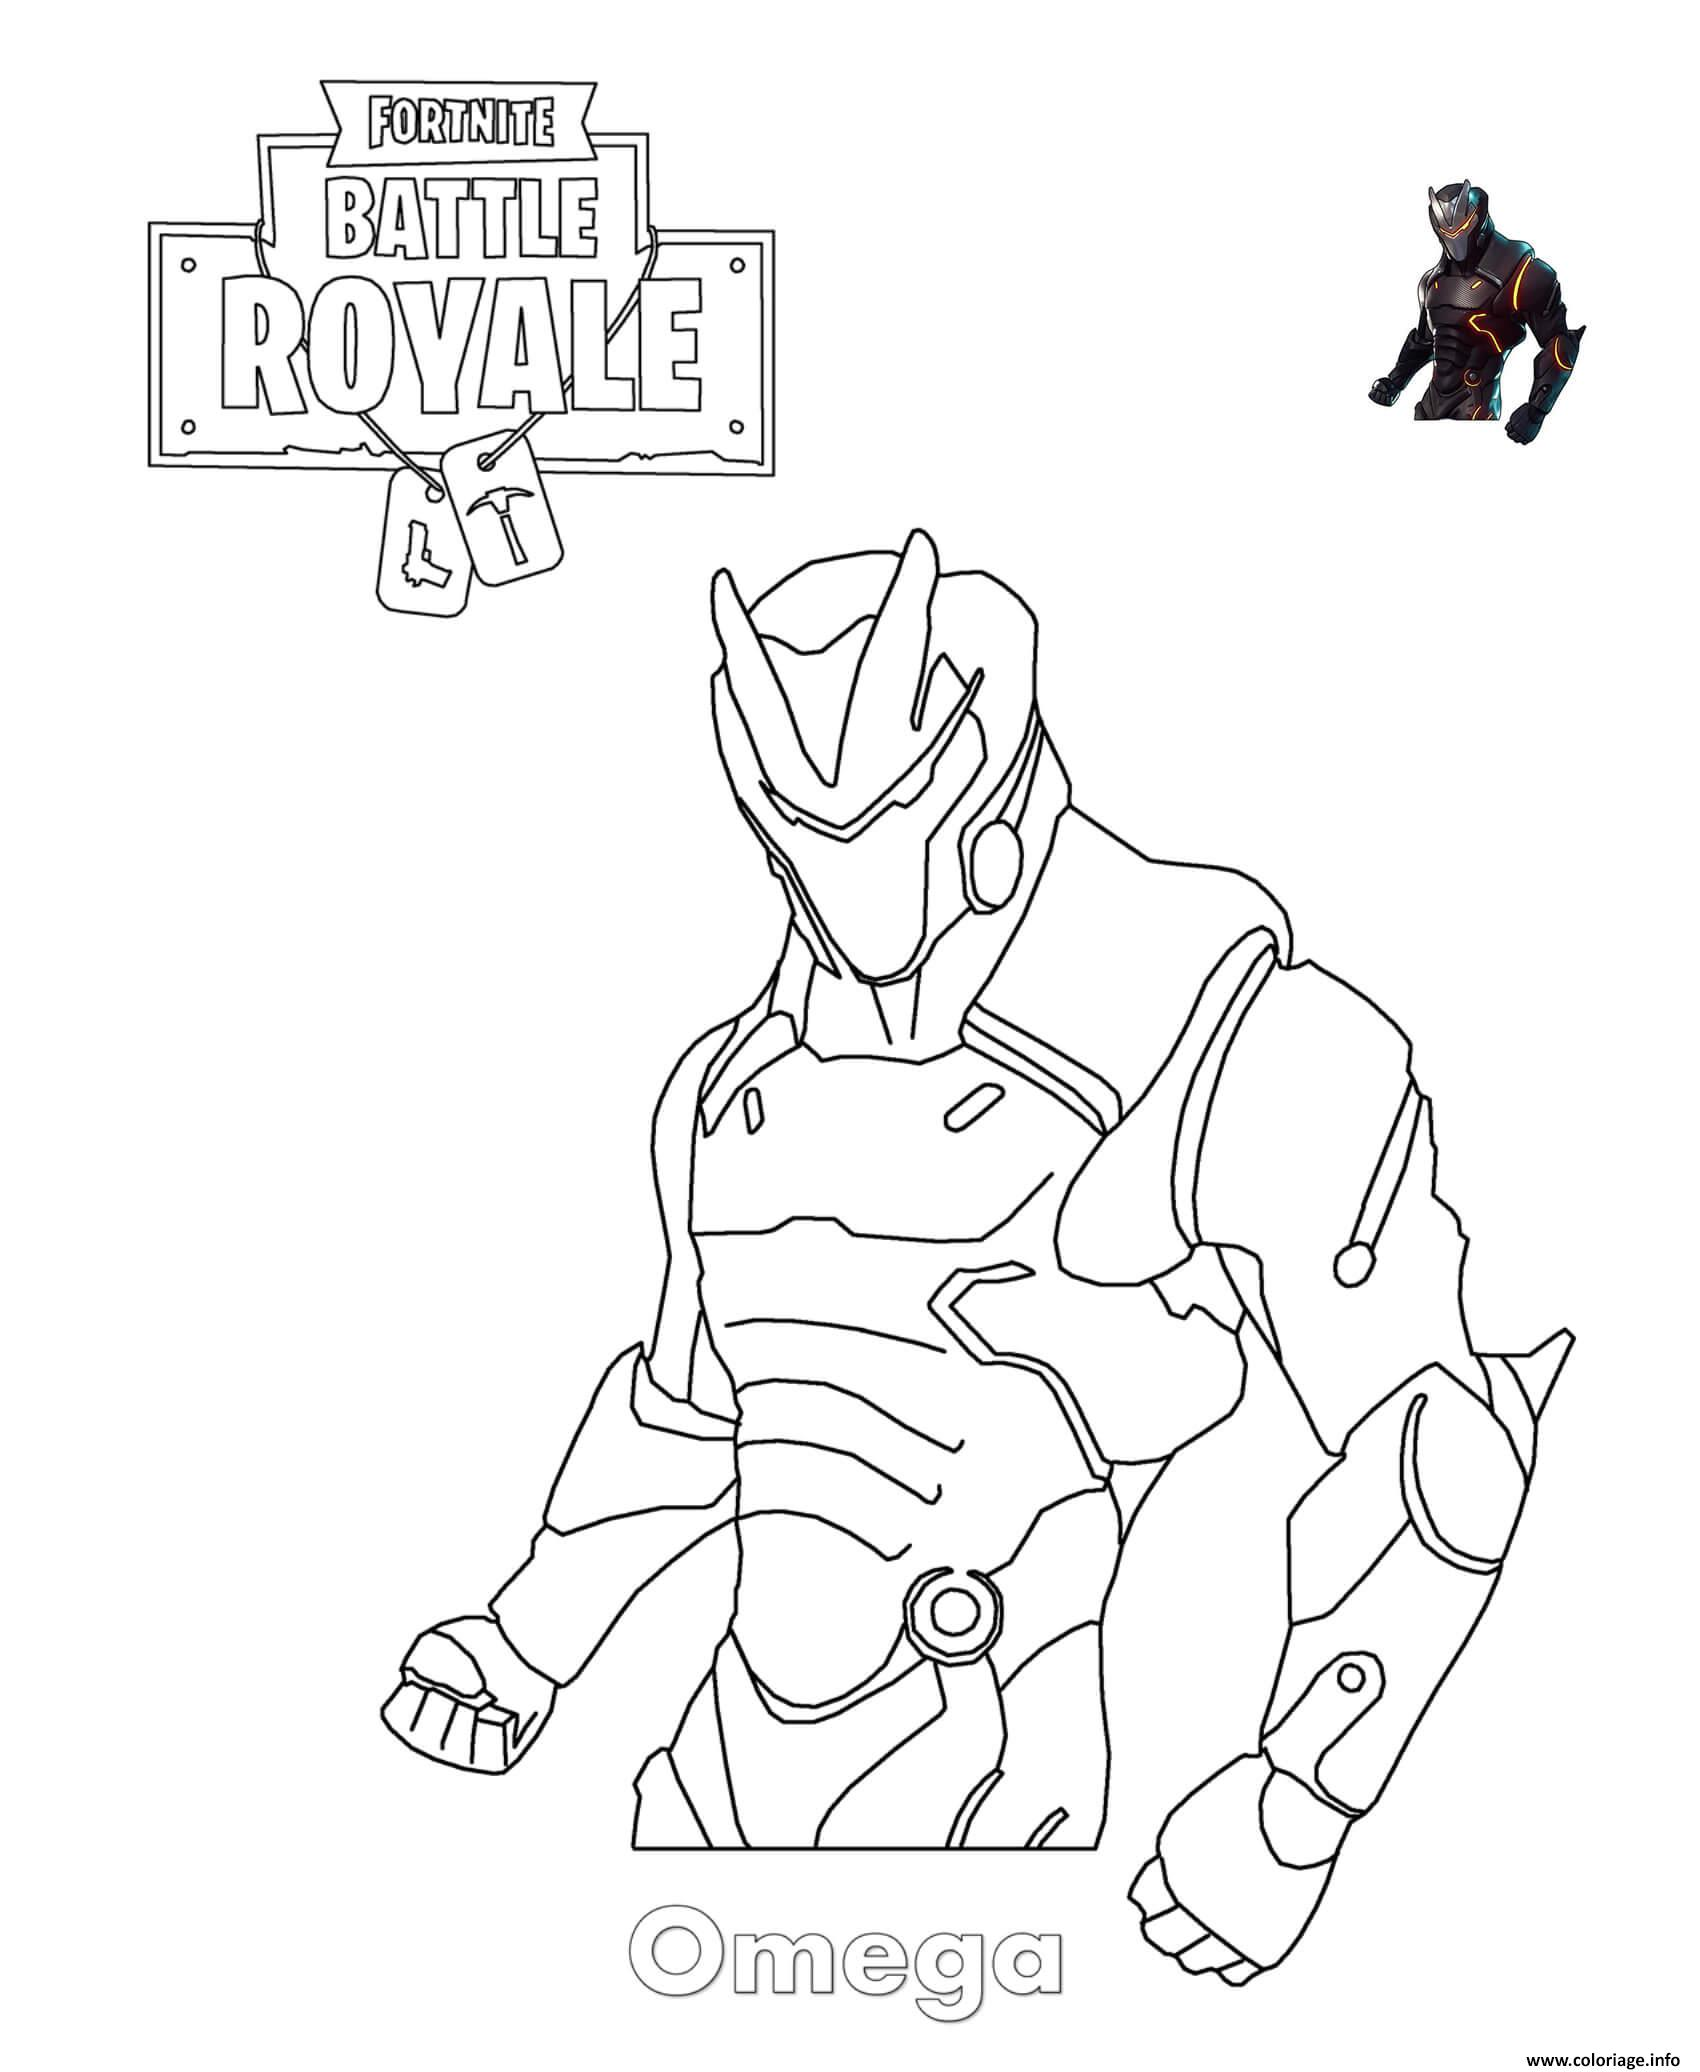 Coloriage Omega Fortnite dessin